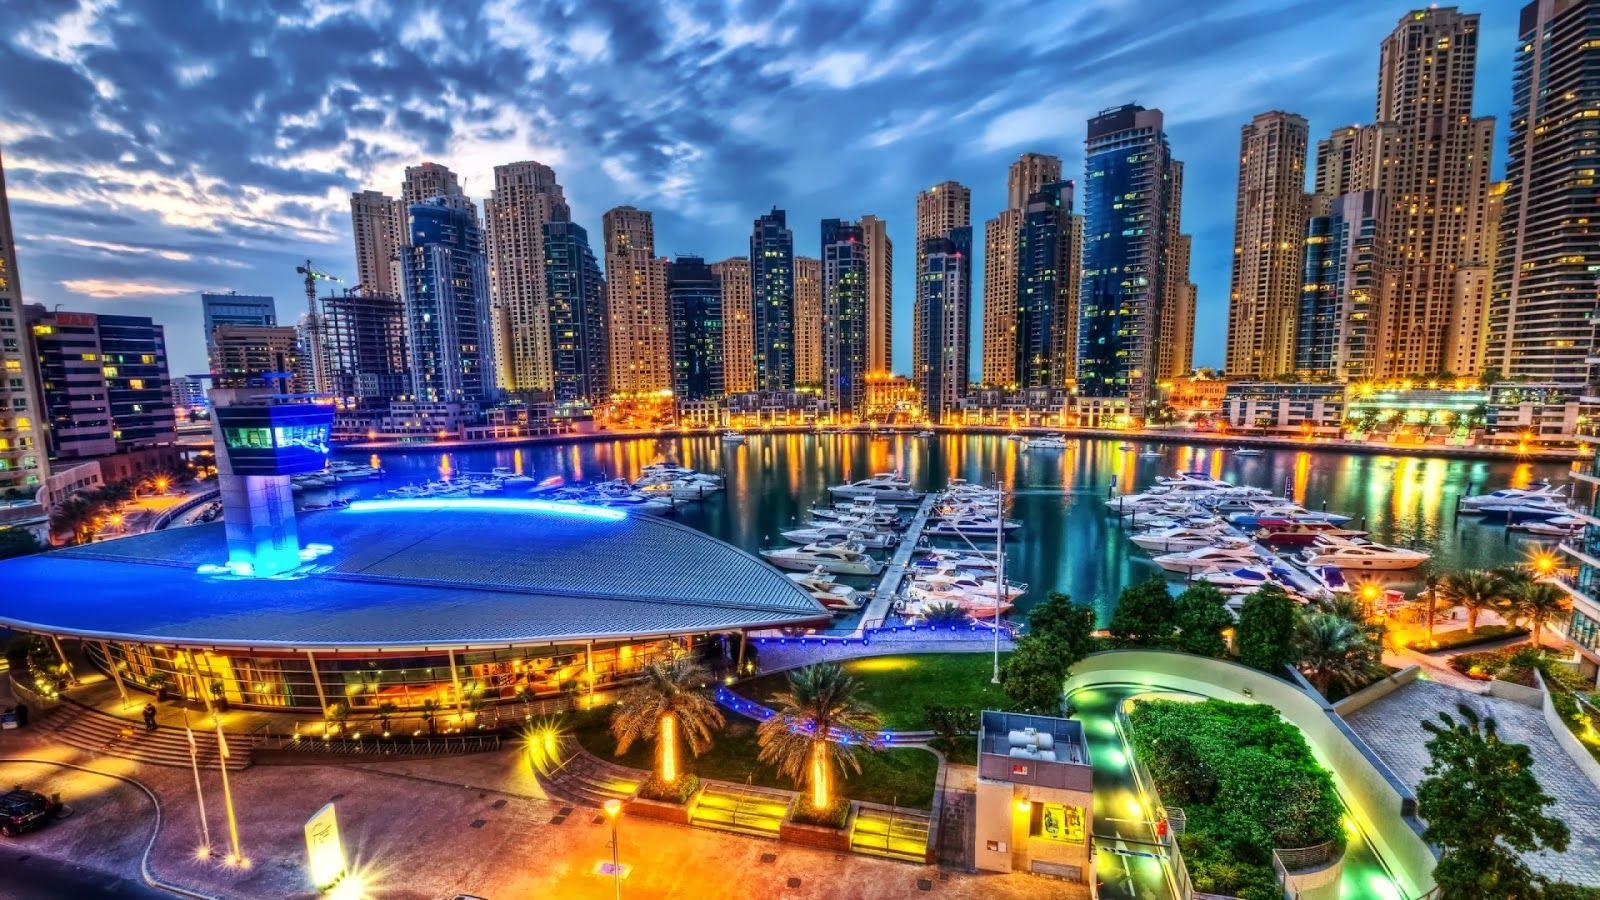 HD WALLPAPERS: Download Dubai City HD Wallpapers 1080p | Dubai in 2019 | Dubai city, City ...